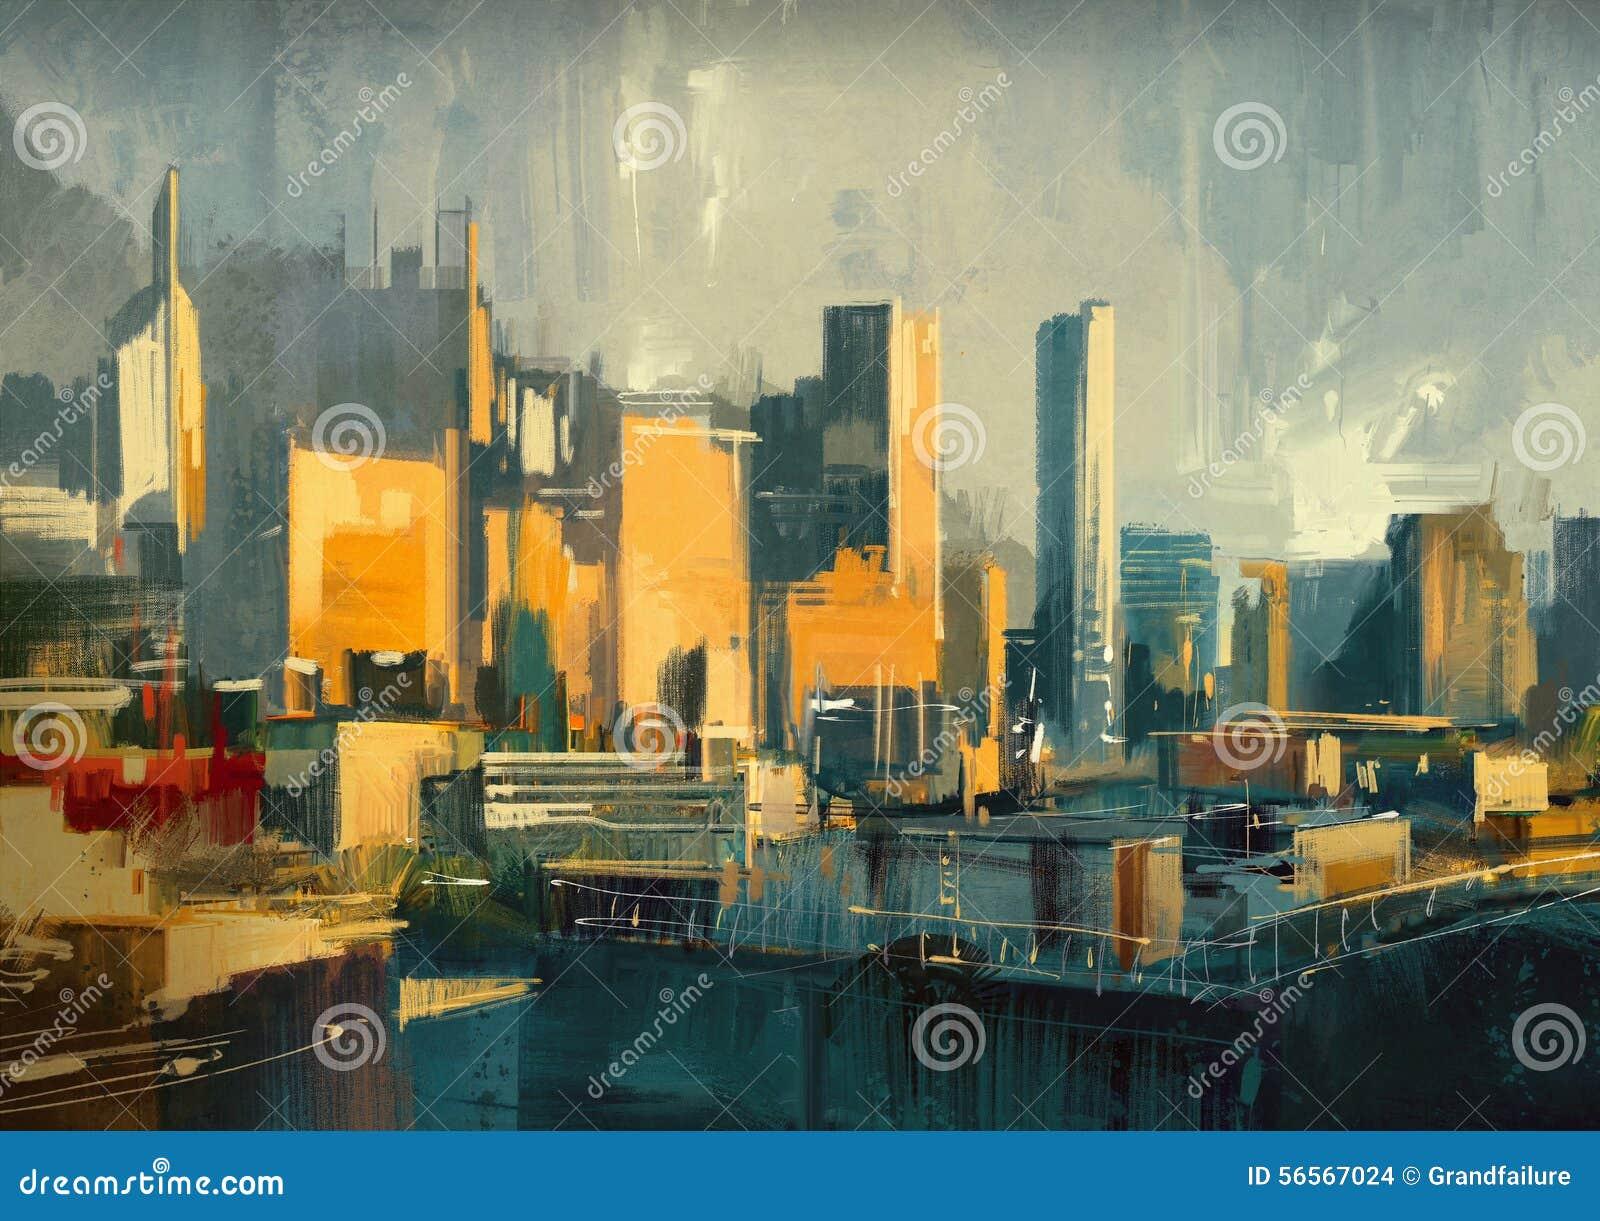 Download Αστικοί ουρανοξύστες στο ηλιοβασίλεμα Απεικόνιση αποθεμάτων - εικονογραφία από αρχιτεκτονικής, στέγη: 56567024